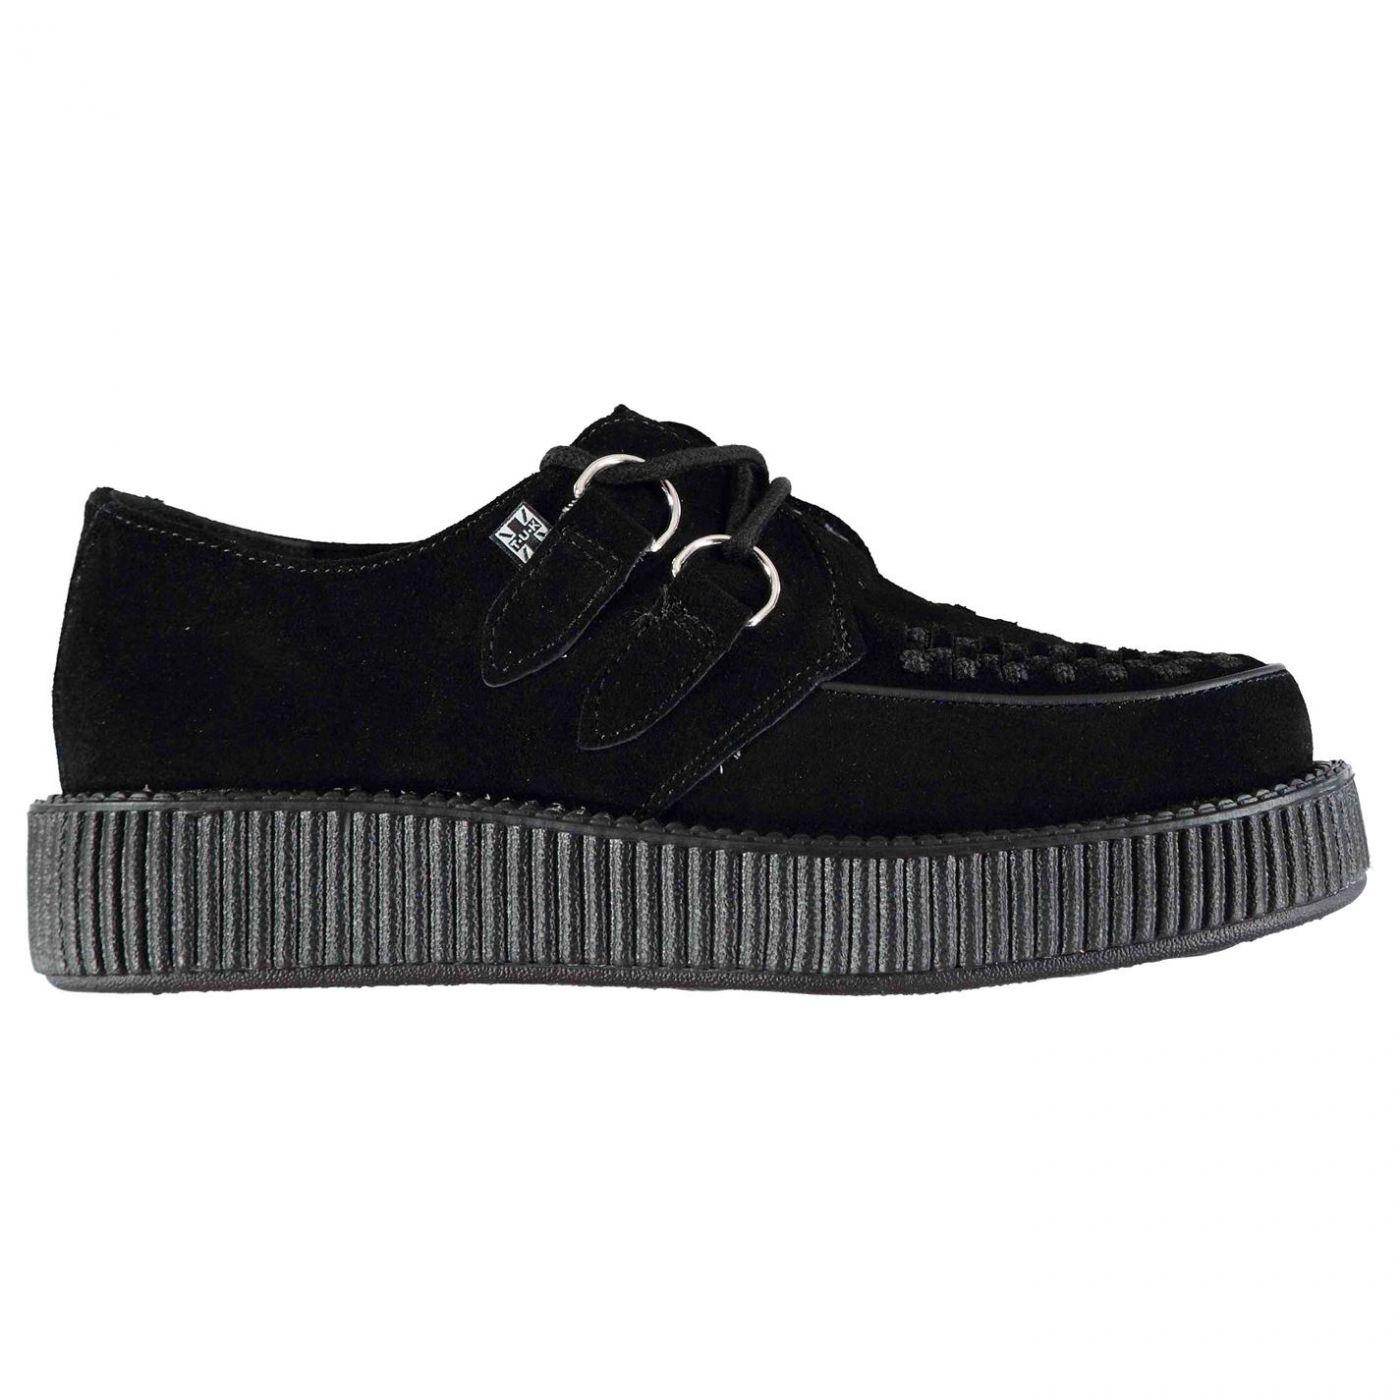 TUK Viva Lo Creeper Shoes Ladies